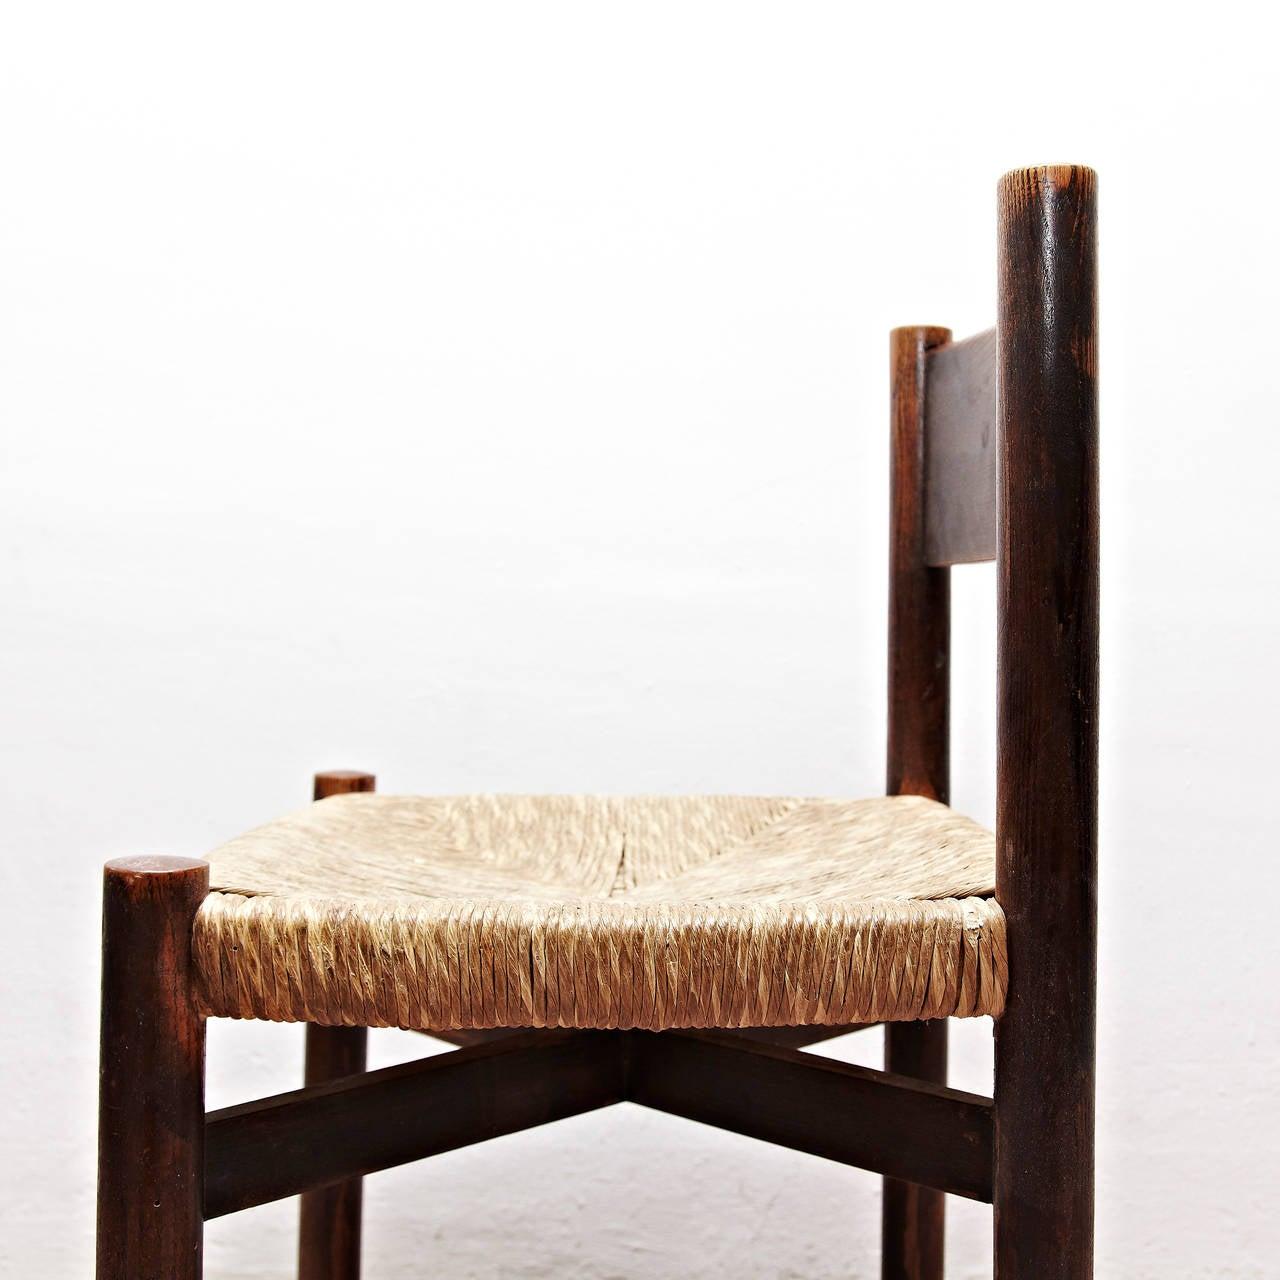 Rush Set of Five Charlotte Perriand Meribel Chair, circa 1950 For Sale